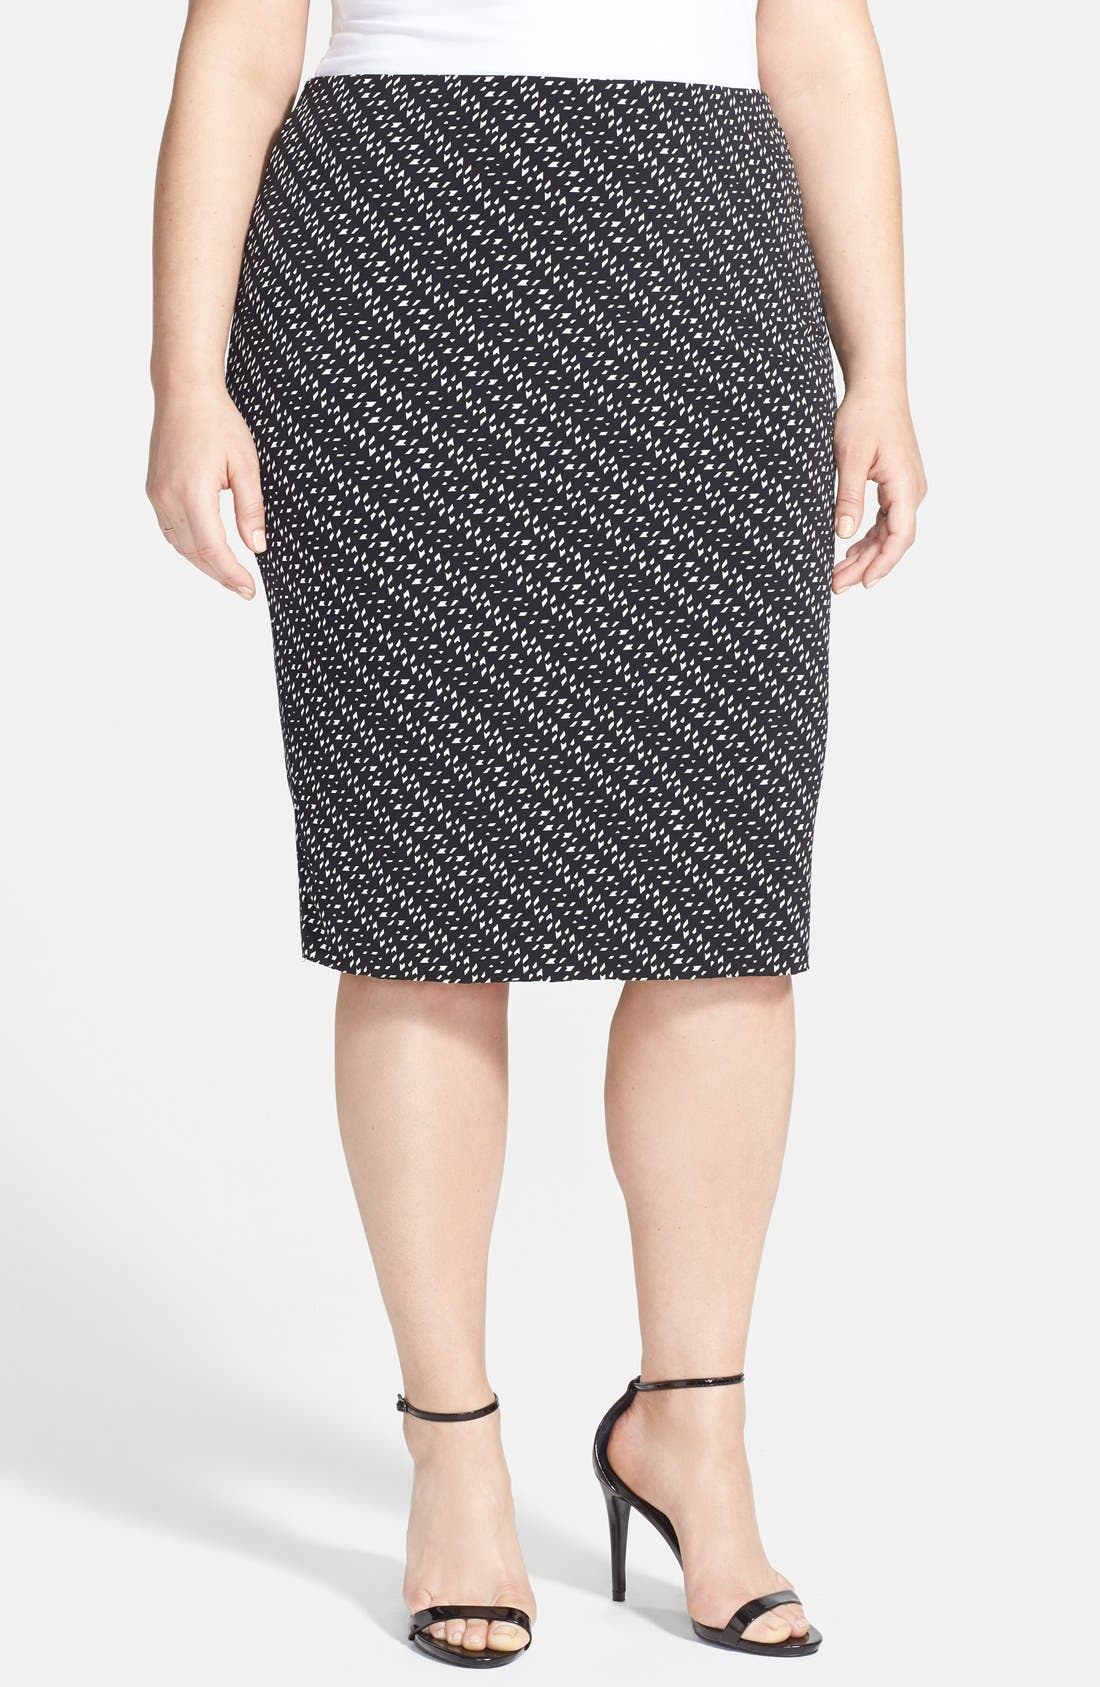 Alternate Image 1 Selected - Vince Camuto 'Graphic Specks' Raw Edge Hem Midi Tube Skirt (Plus Size)